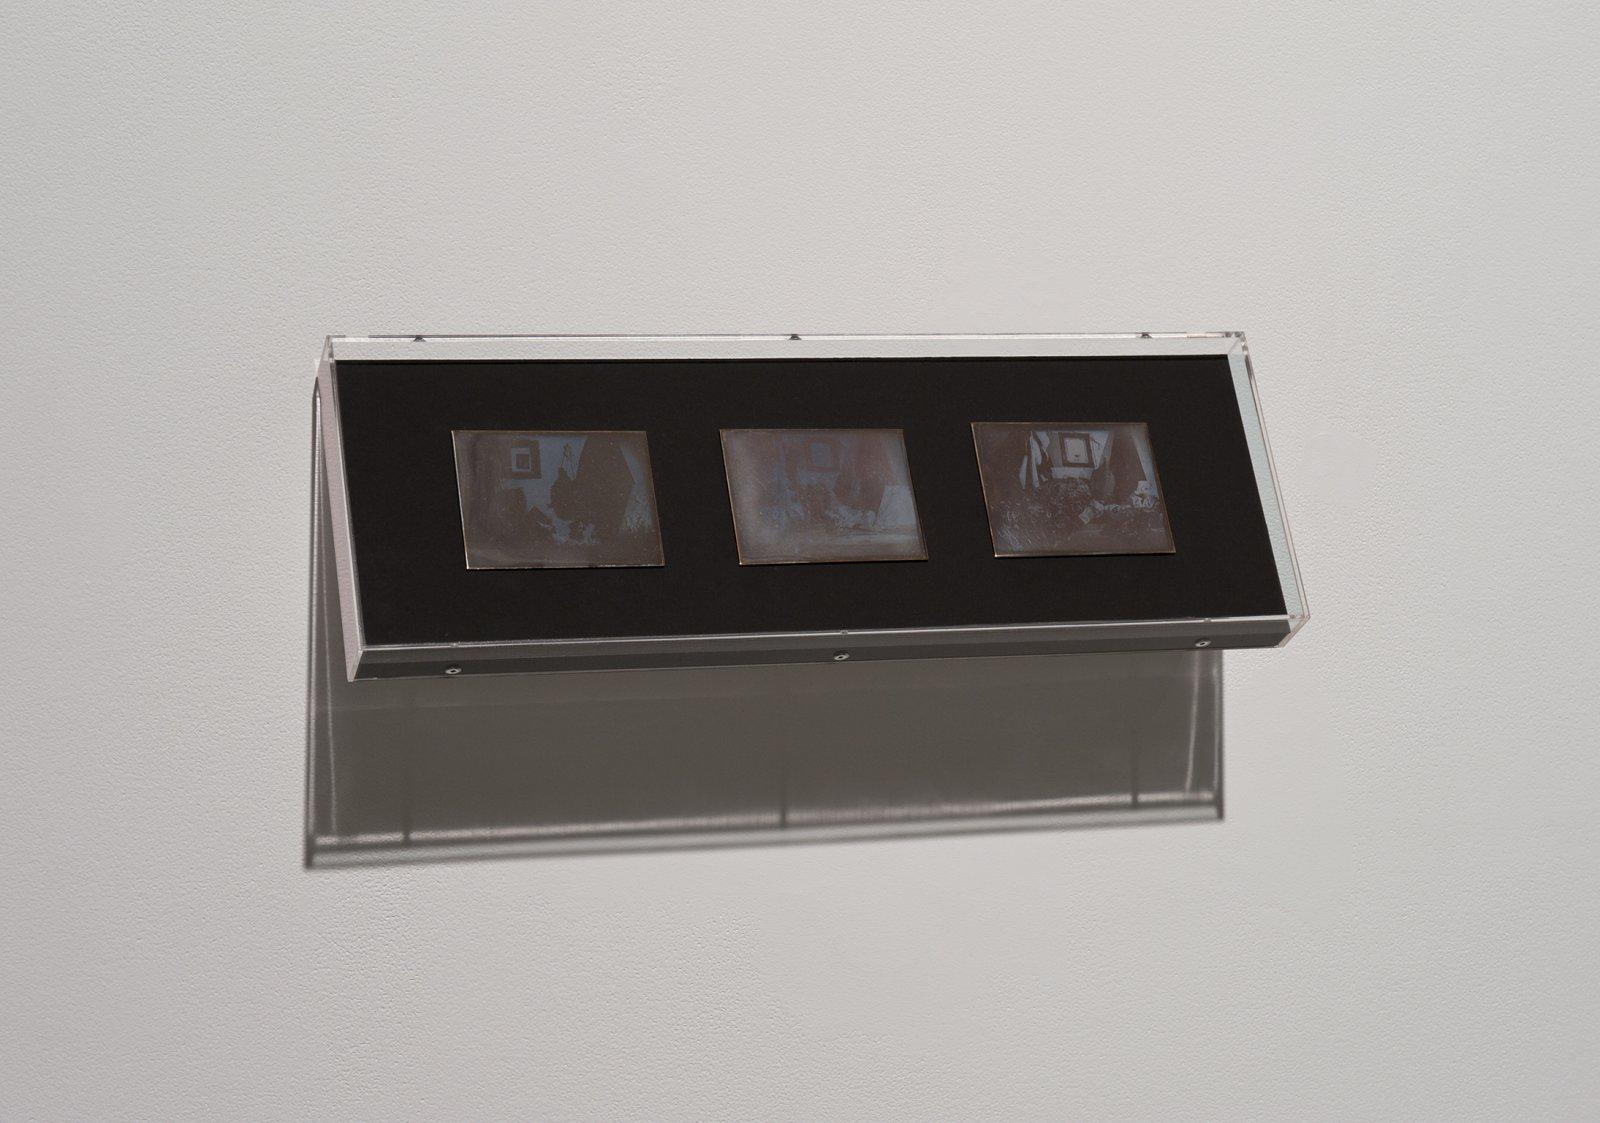 Julia Feyrer, Studio 1, 2 & 3, 2010, Becquerel Daguerreotypes on silver coated brass, 7 x 21 x 2 in. (19 x 54 x 2 cm), each daguerreotype: 3 x 4 in. (9 x 11 cm) by Julia Feyrer